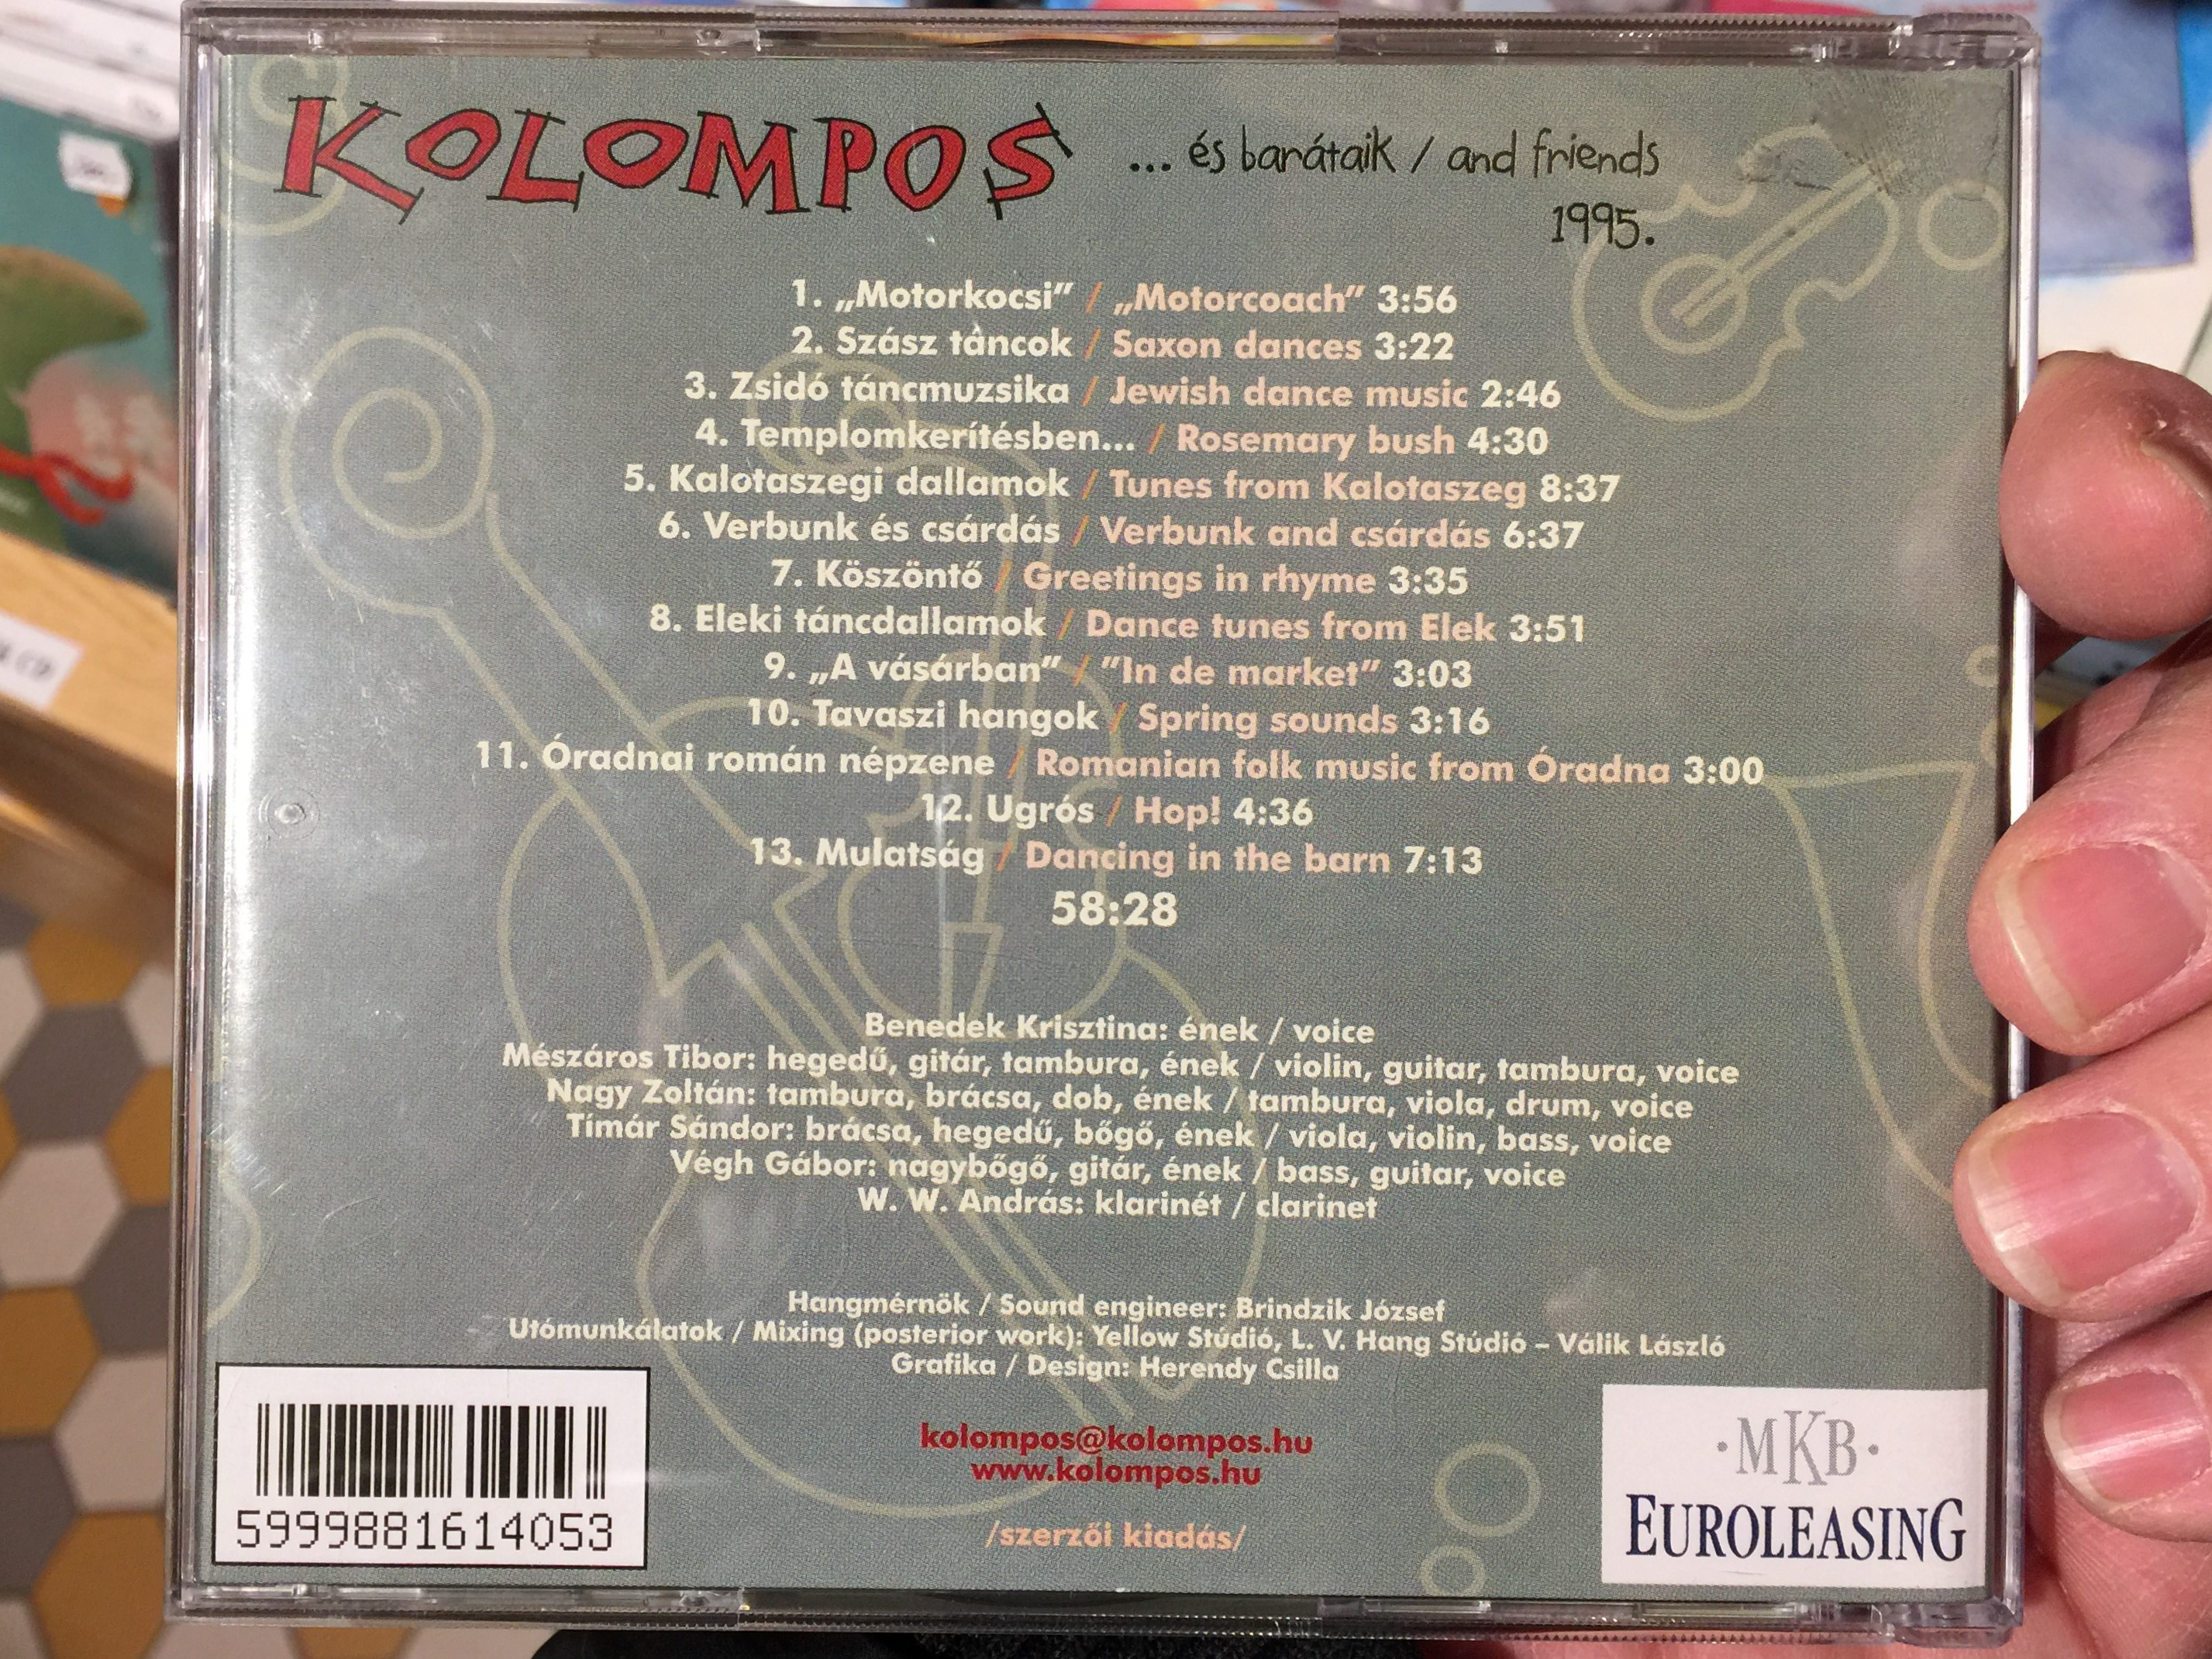 kolompos-...-s-bar-taik-1995.-kolompos-kkt.-audio-cd-2005-k-05-2-.jpg